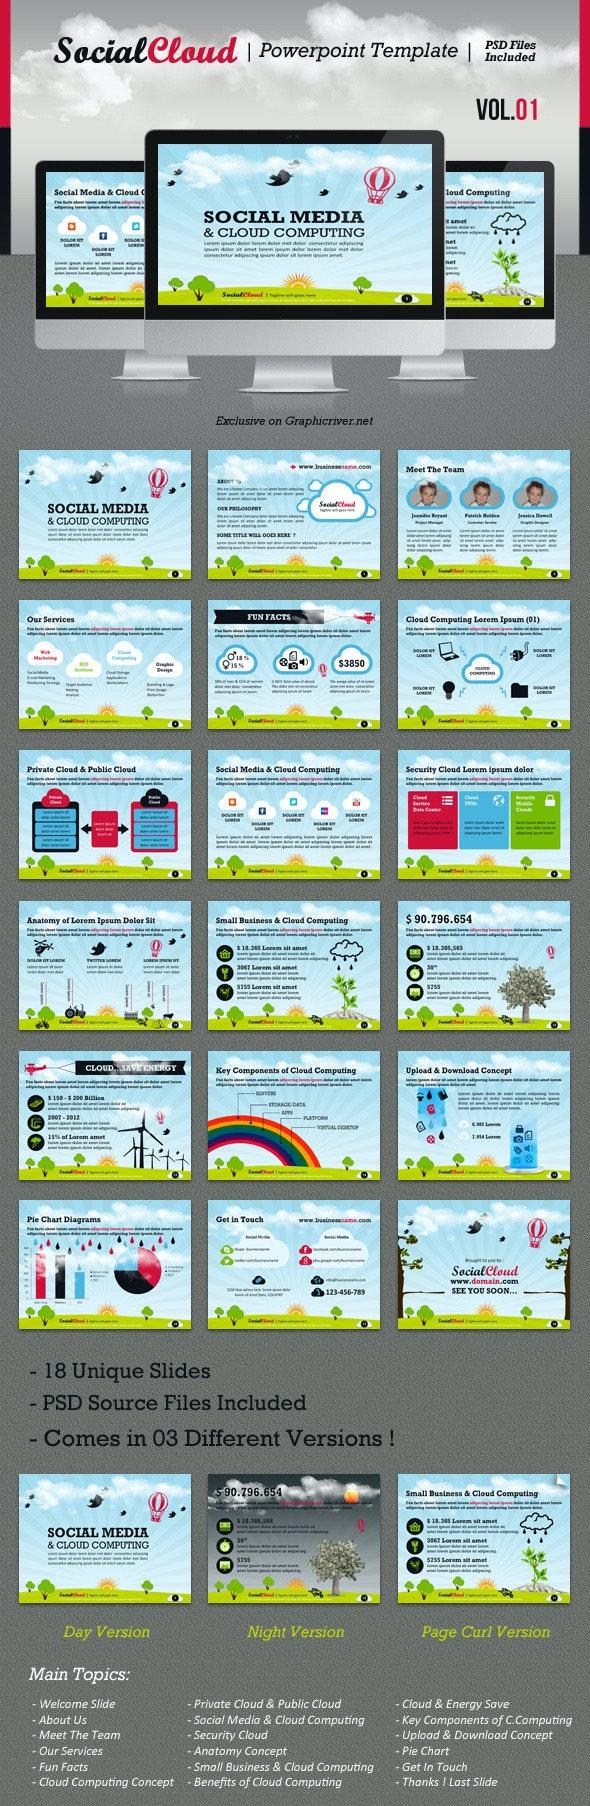 SocialCloud Powerpoint Template V.01 - Creative PowerPoint Templates